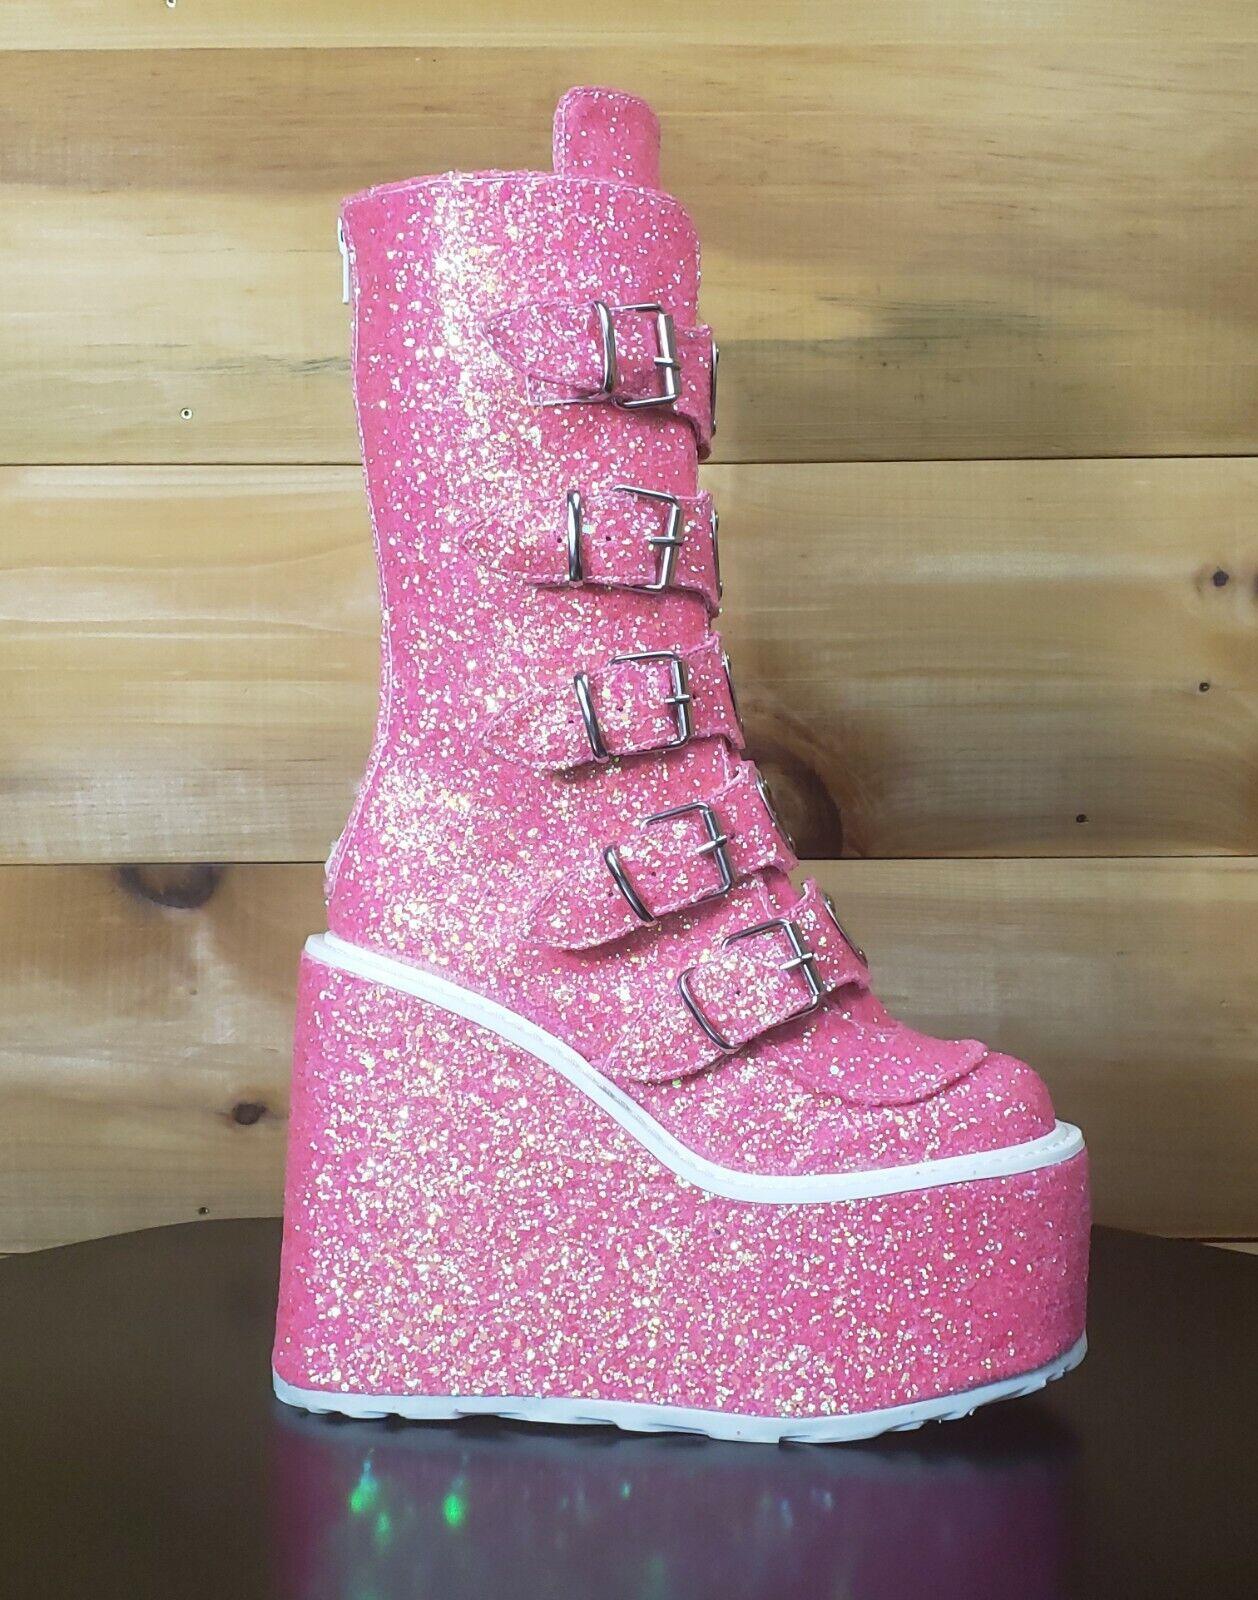 Swing 230G Pink Glitter Boot 5.5  Platform Heart Strap Design Goth Size 12